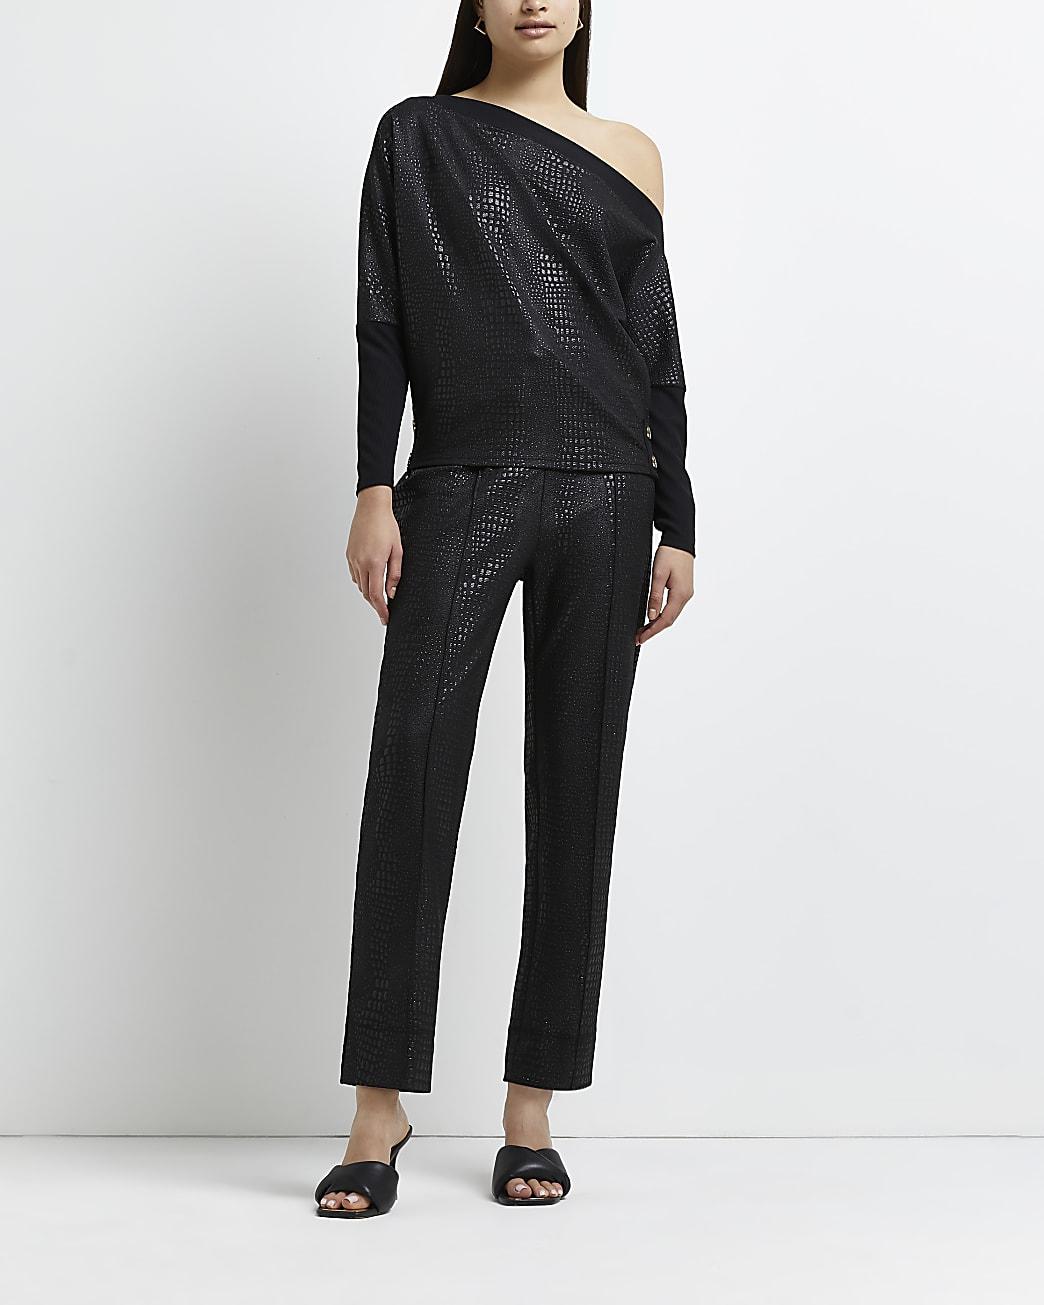 Black croc embossed coated trousers